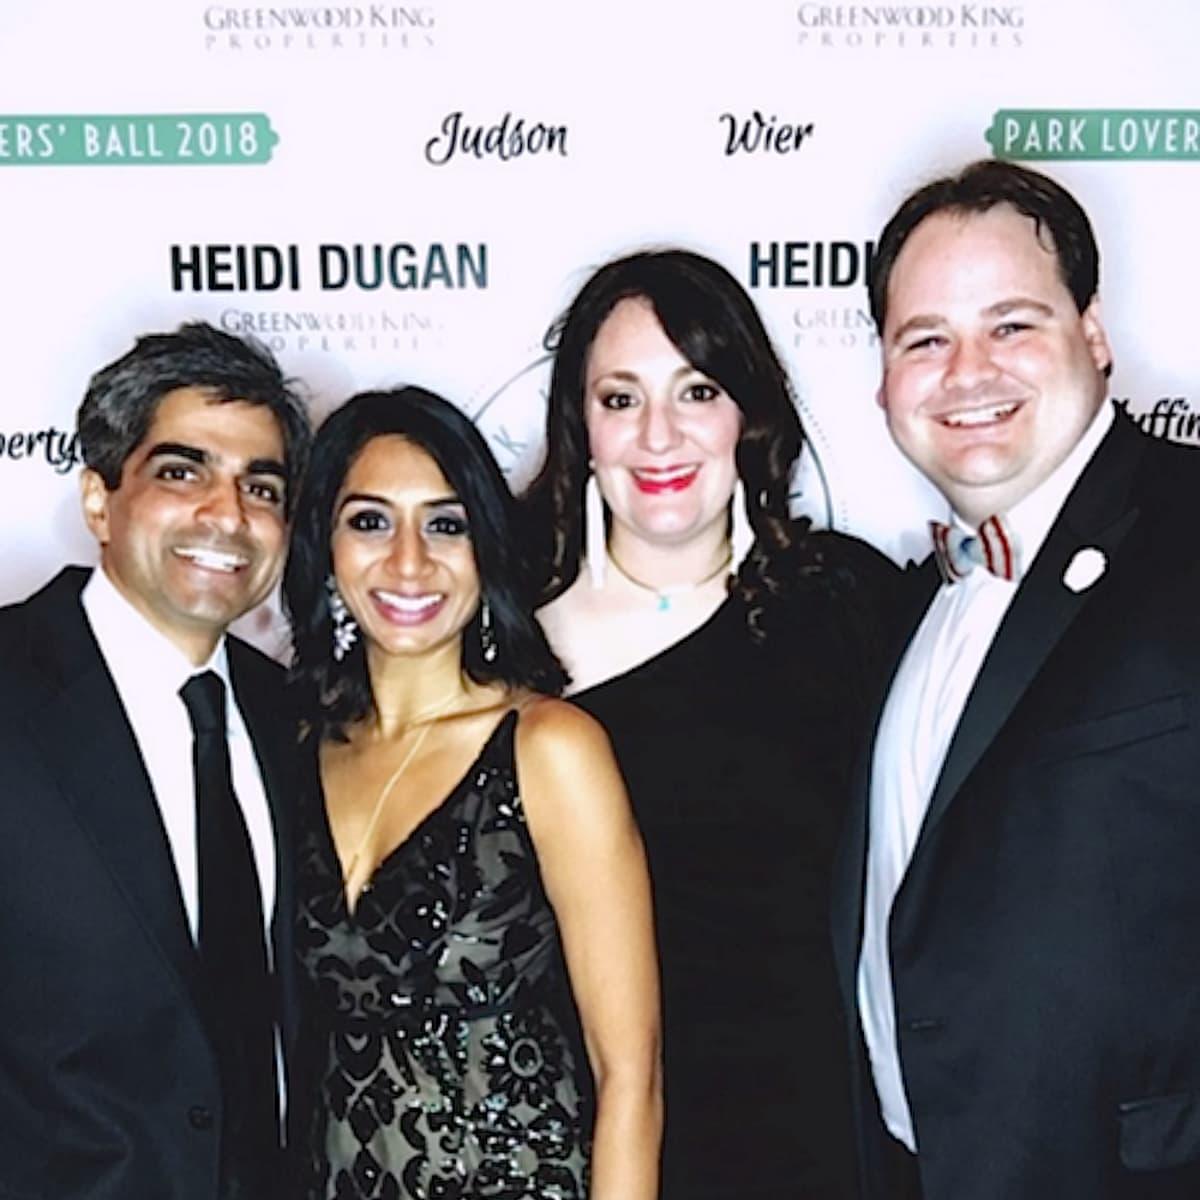 Houston, West University Park Lovers' Ball, February 2018, Vikas Shah, Prina Shah, Mitra Woody, Josh Woody